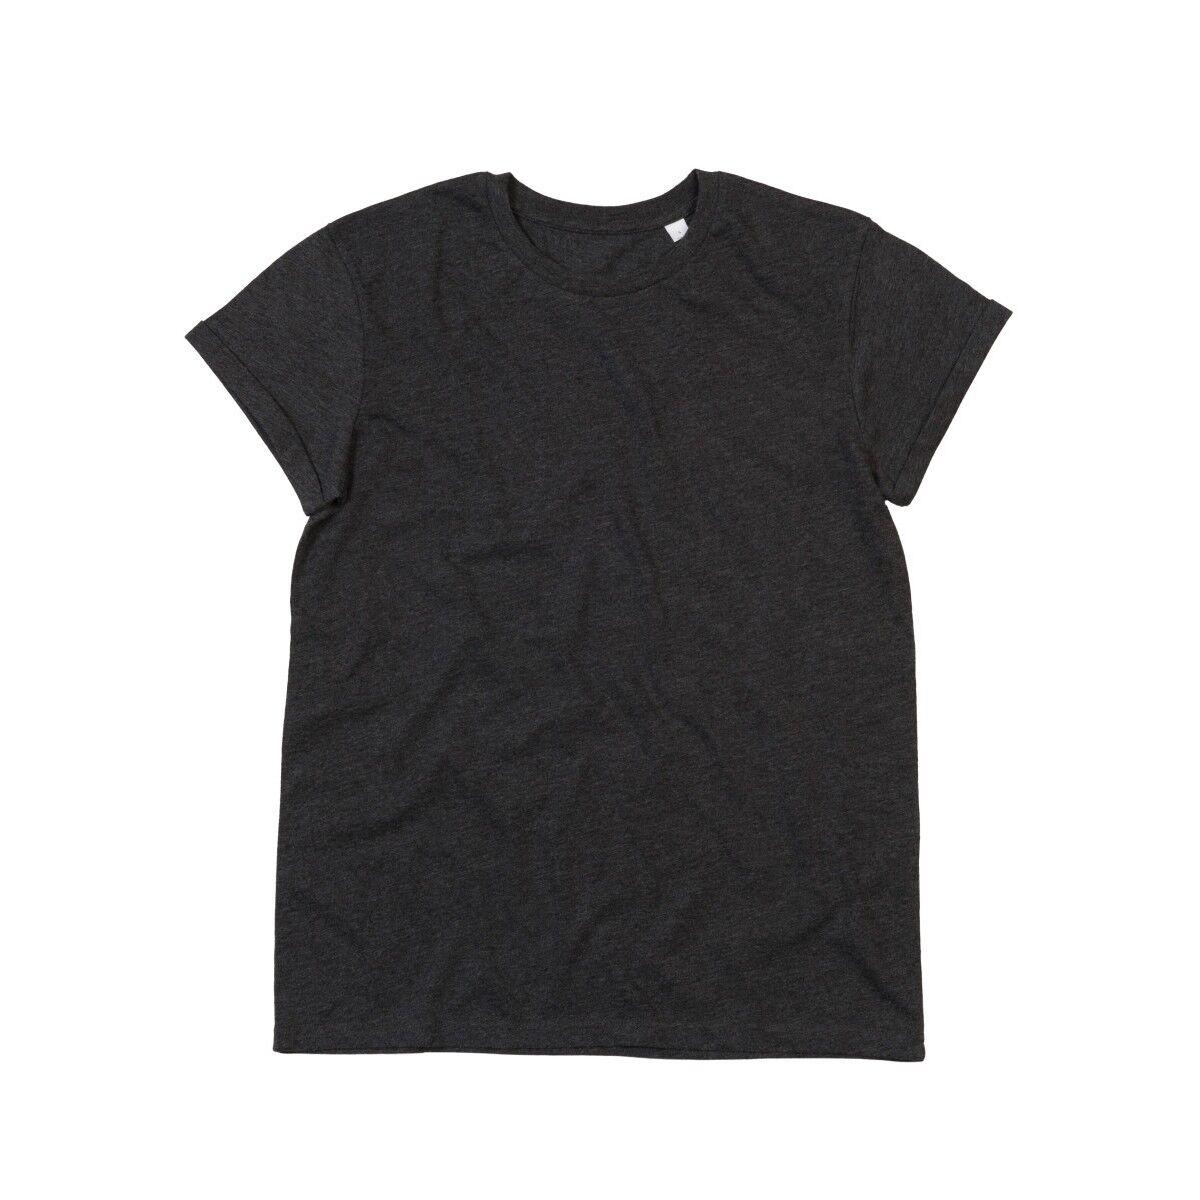 Mantis Roll Sleeve T Shirt - Charcoal Grey